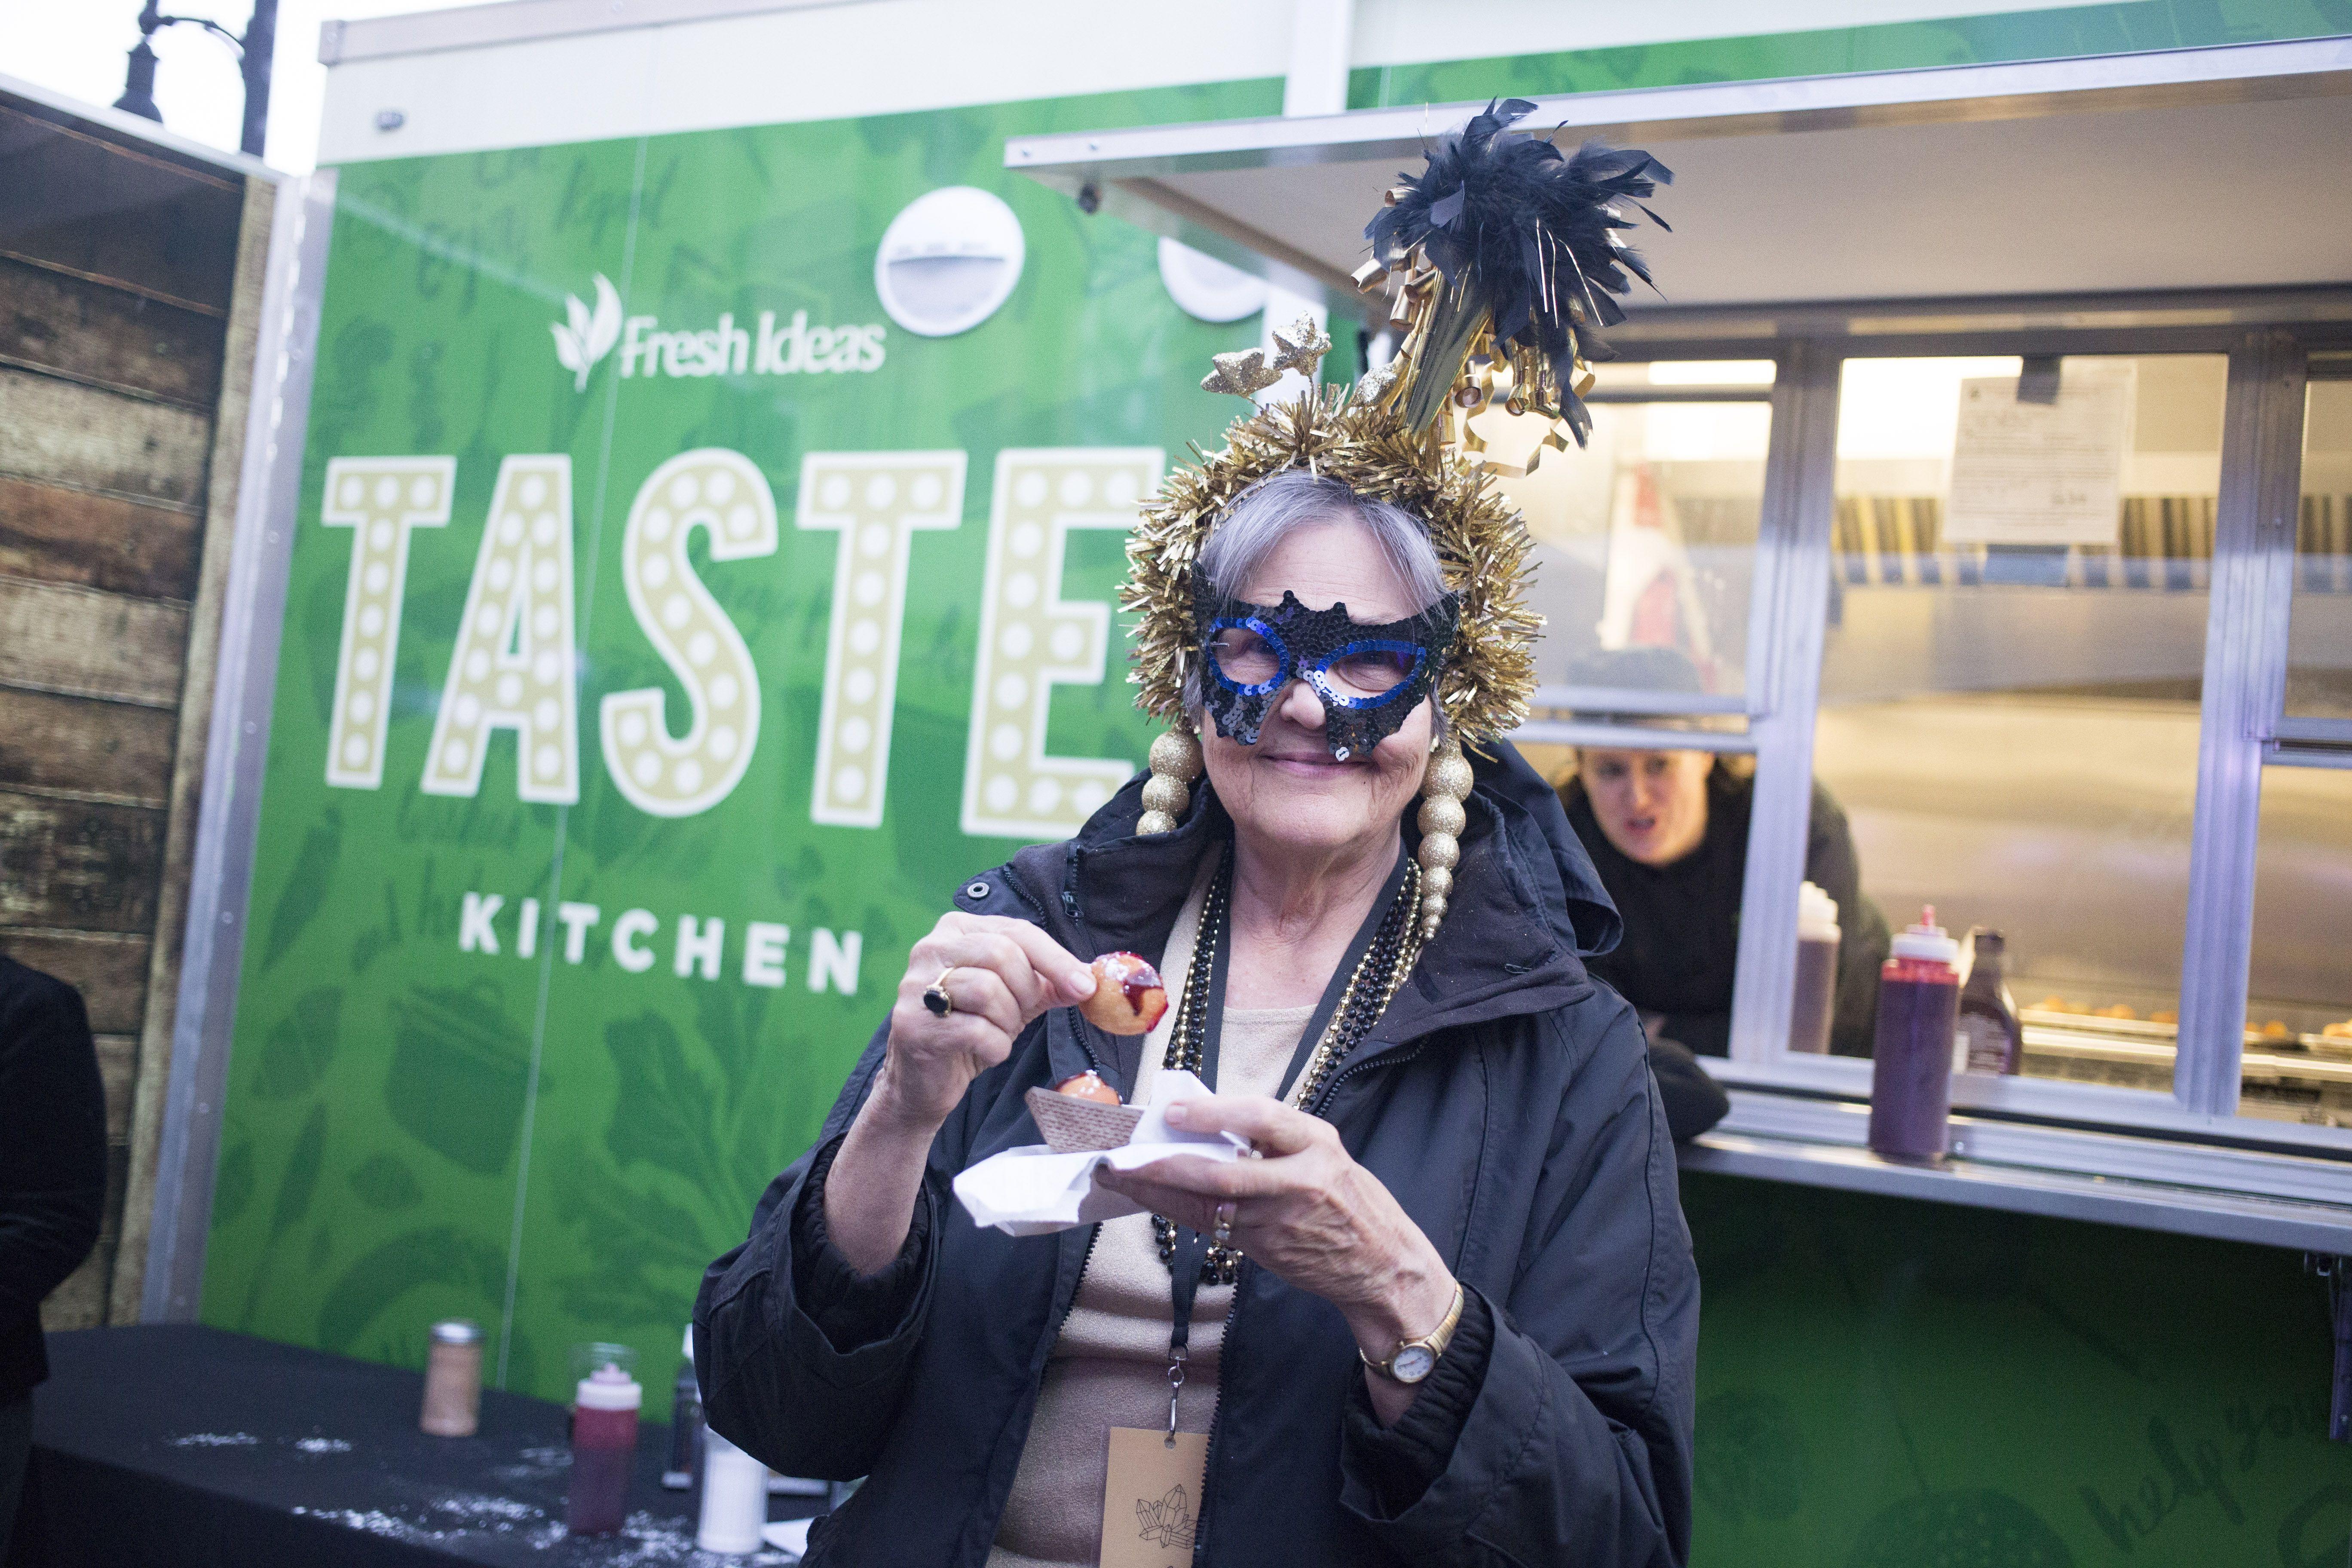 fresh ideas food truck at the true/false film festival in columbia